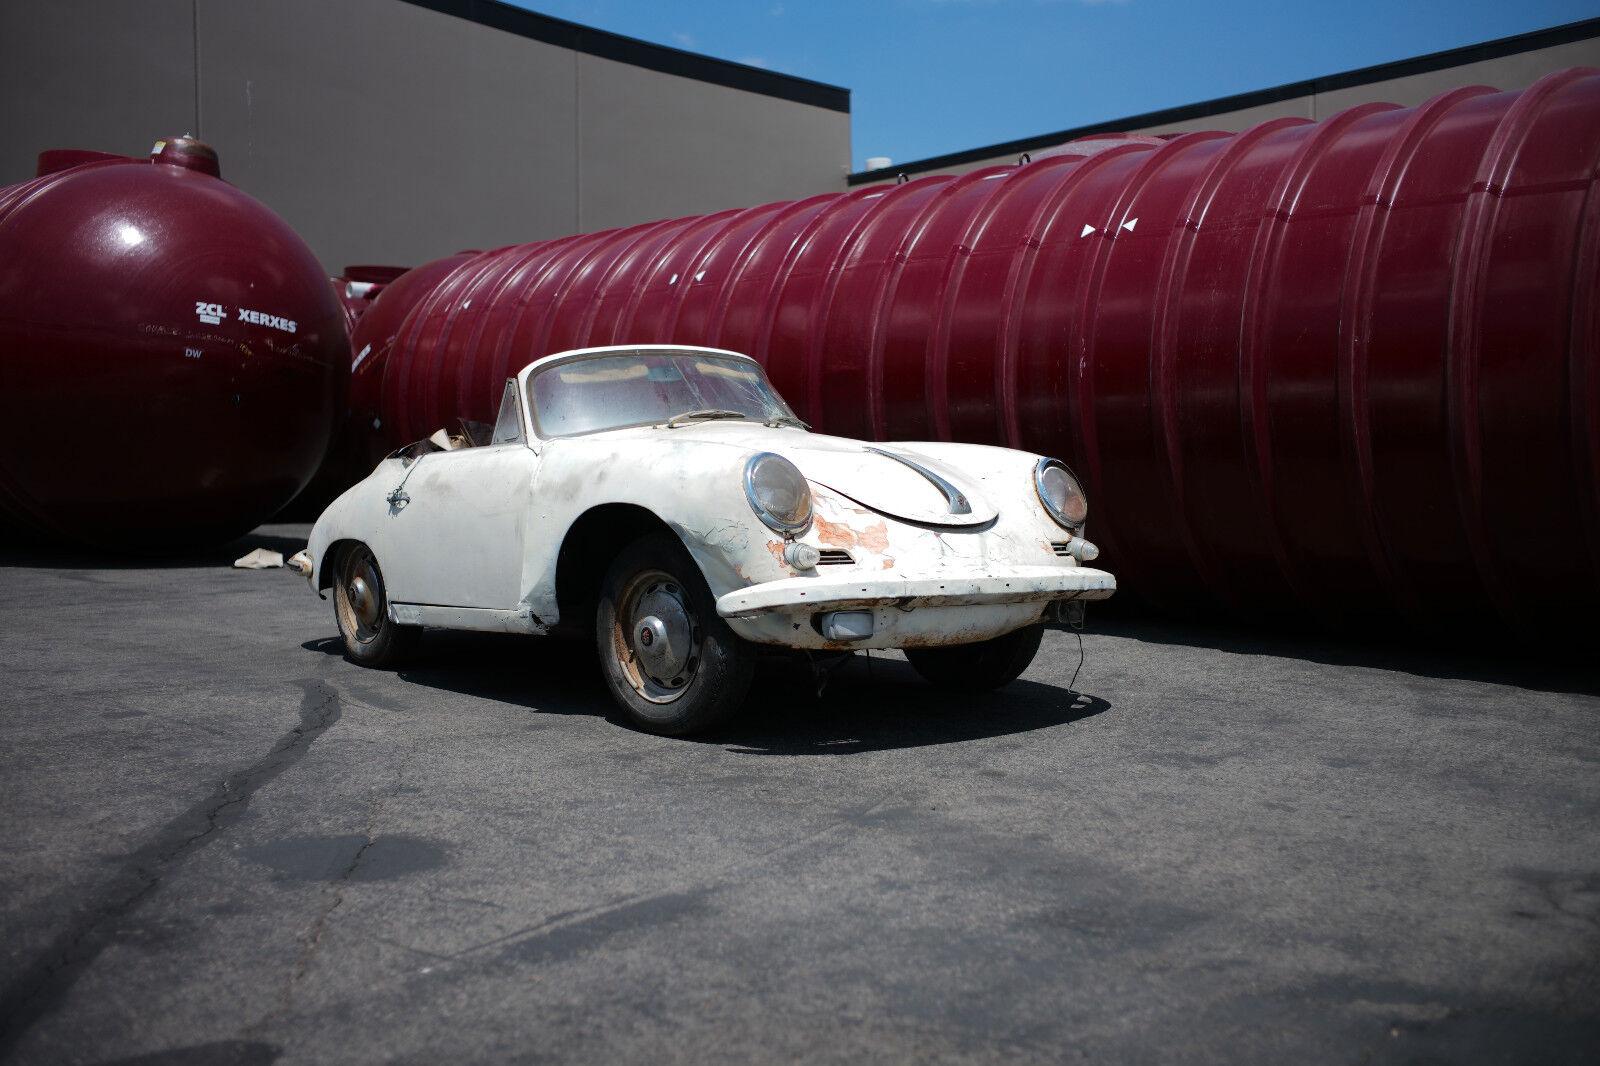 1960 Porsche 356 CABRIOLET REMOVABLE HARDTOP 1960 PORSCHE  CABRIOLET 1600-SUPER BIG TANK 80 LITER Numbers Matching